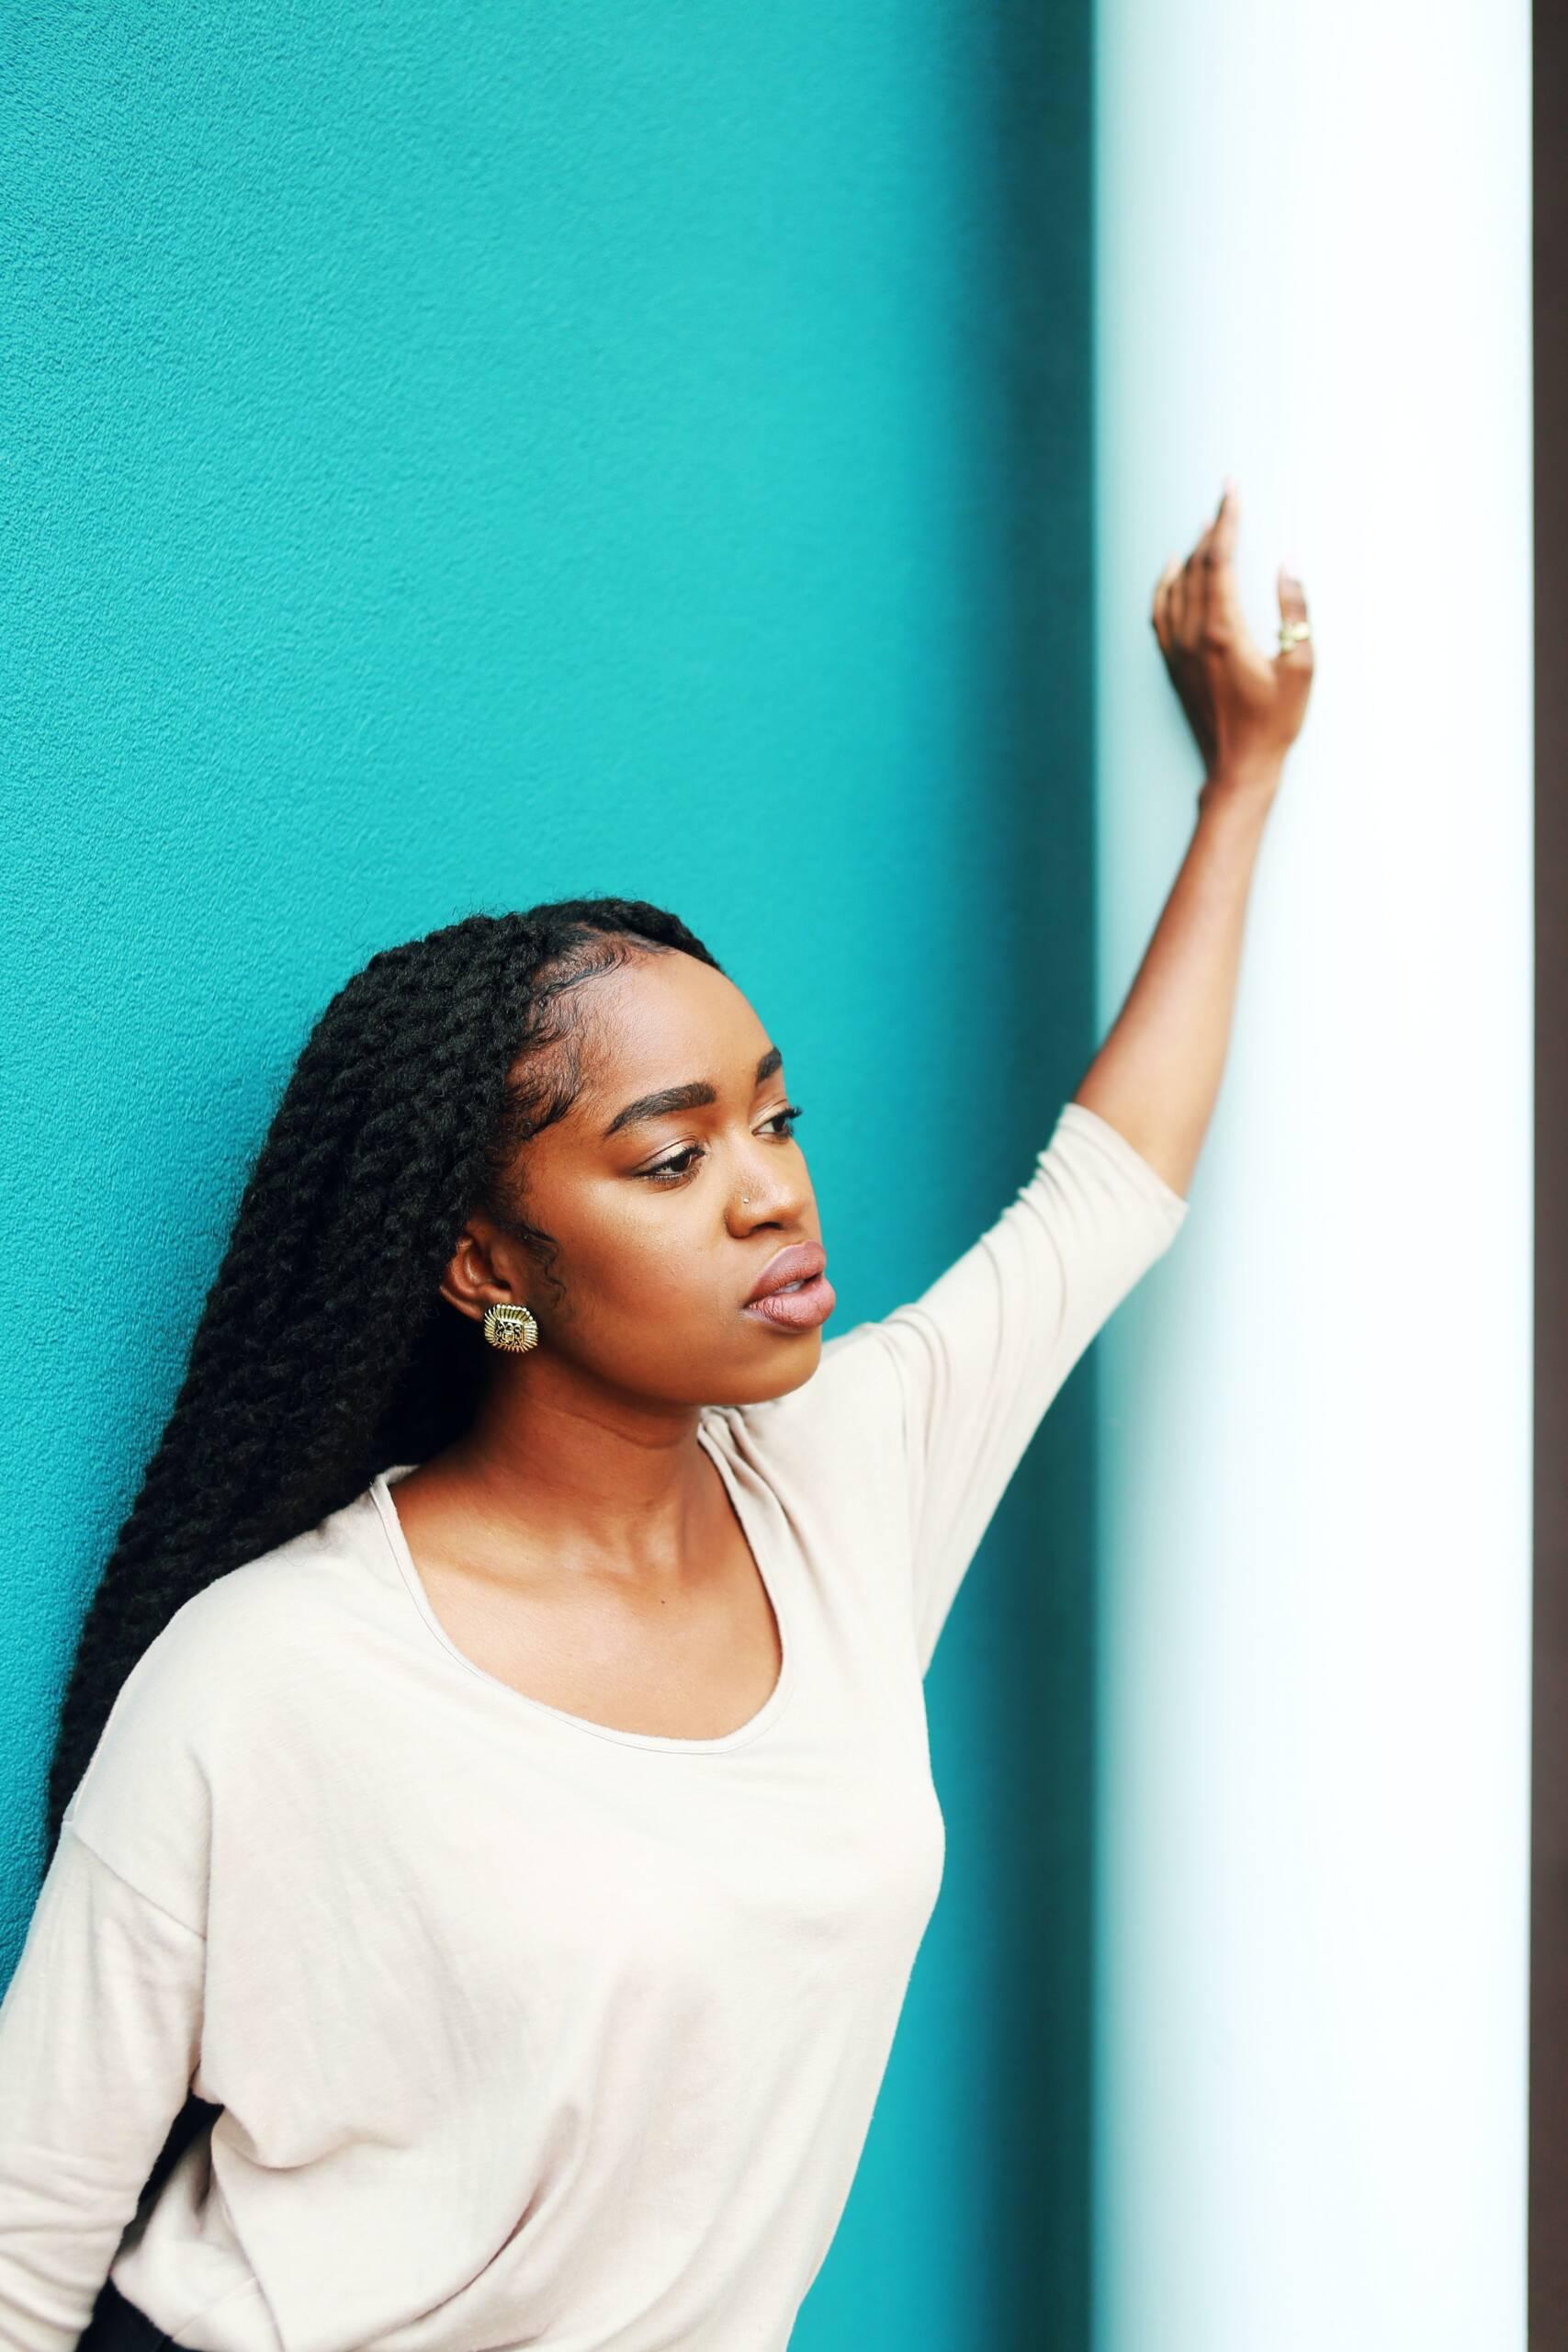 3 Roadblocks to BIOPC and Mental Health